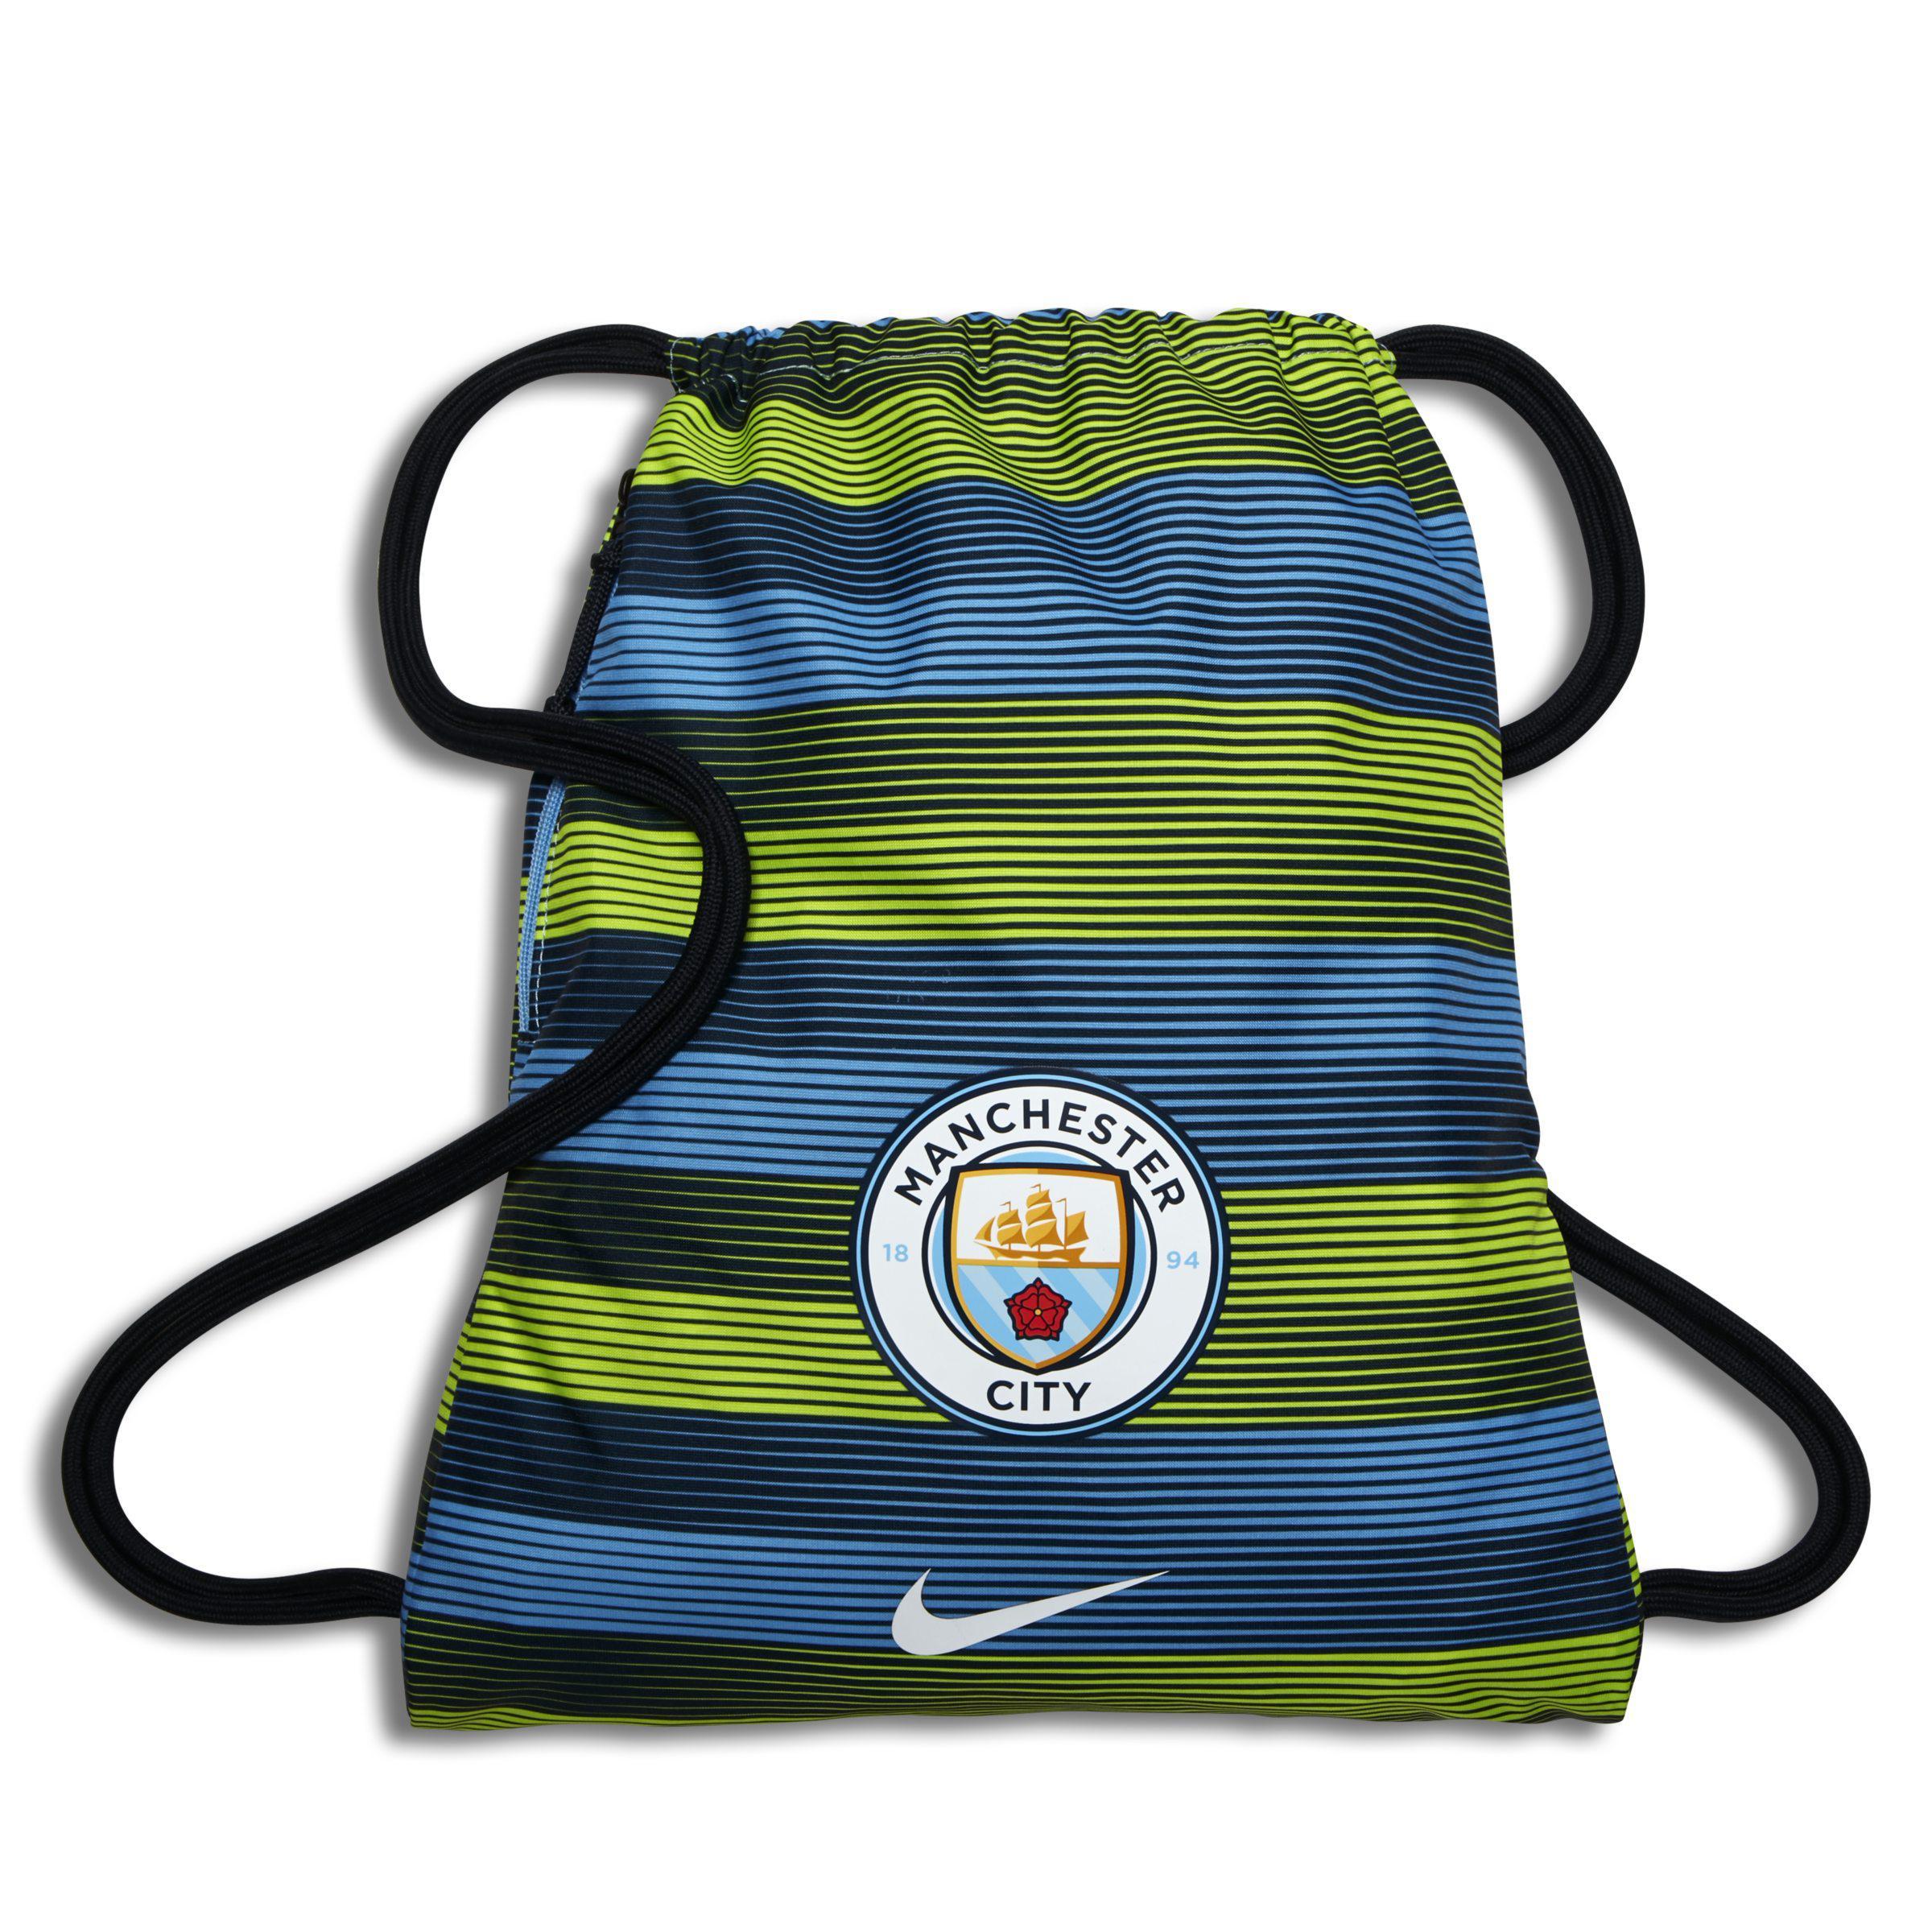 5632df44d5 Nike Manchester City Fc Stadium Football Gymsack in Blue - Lyst